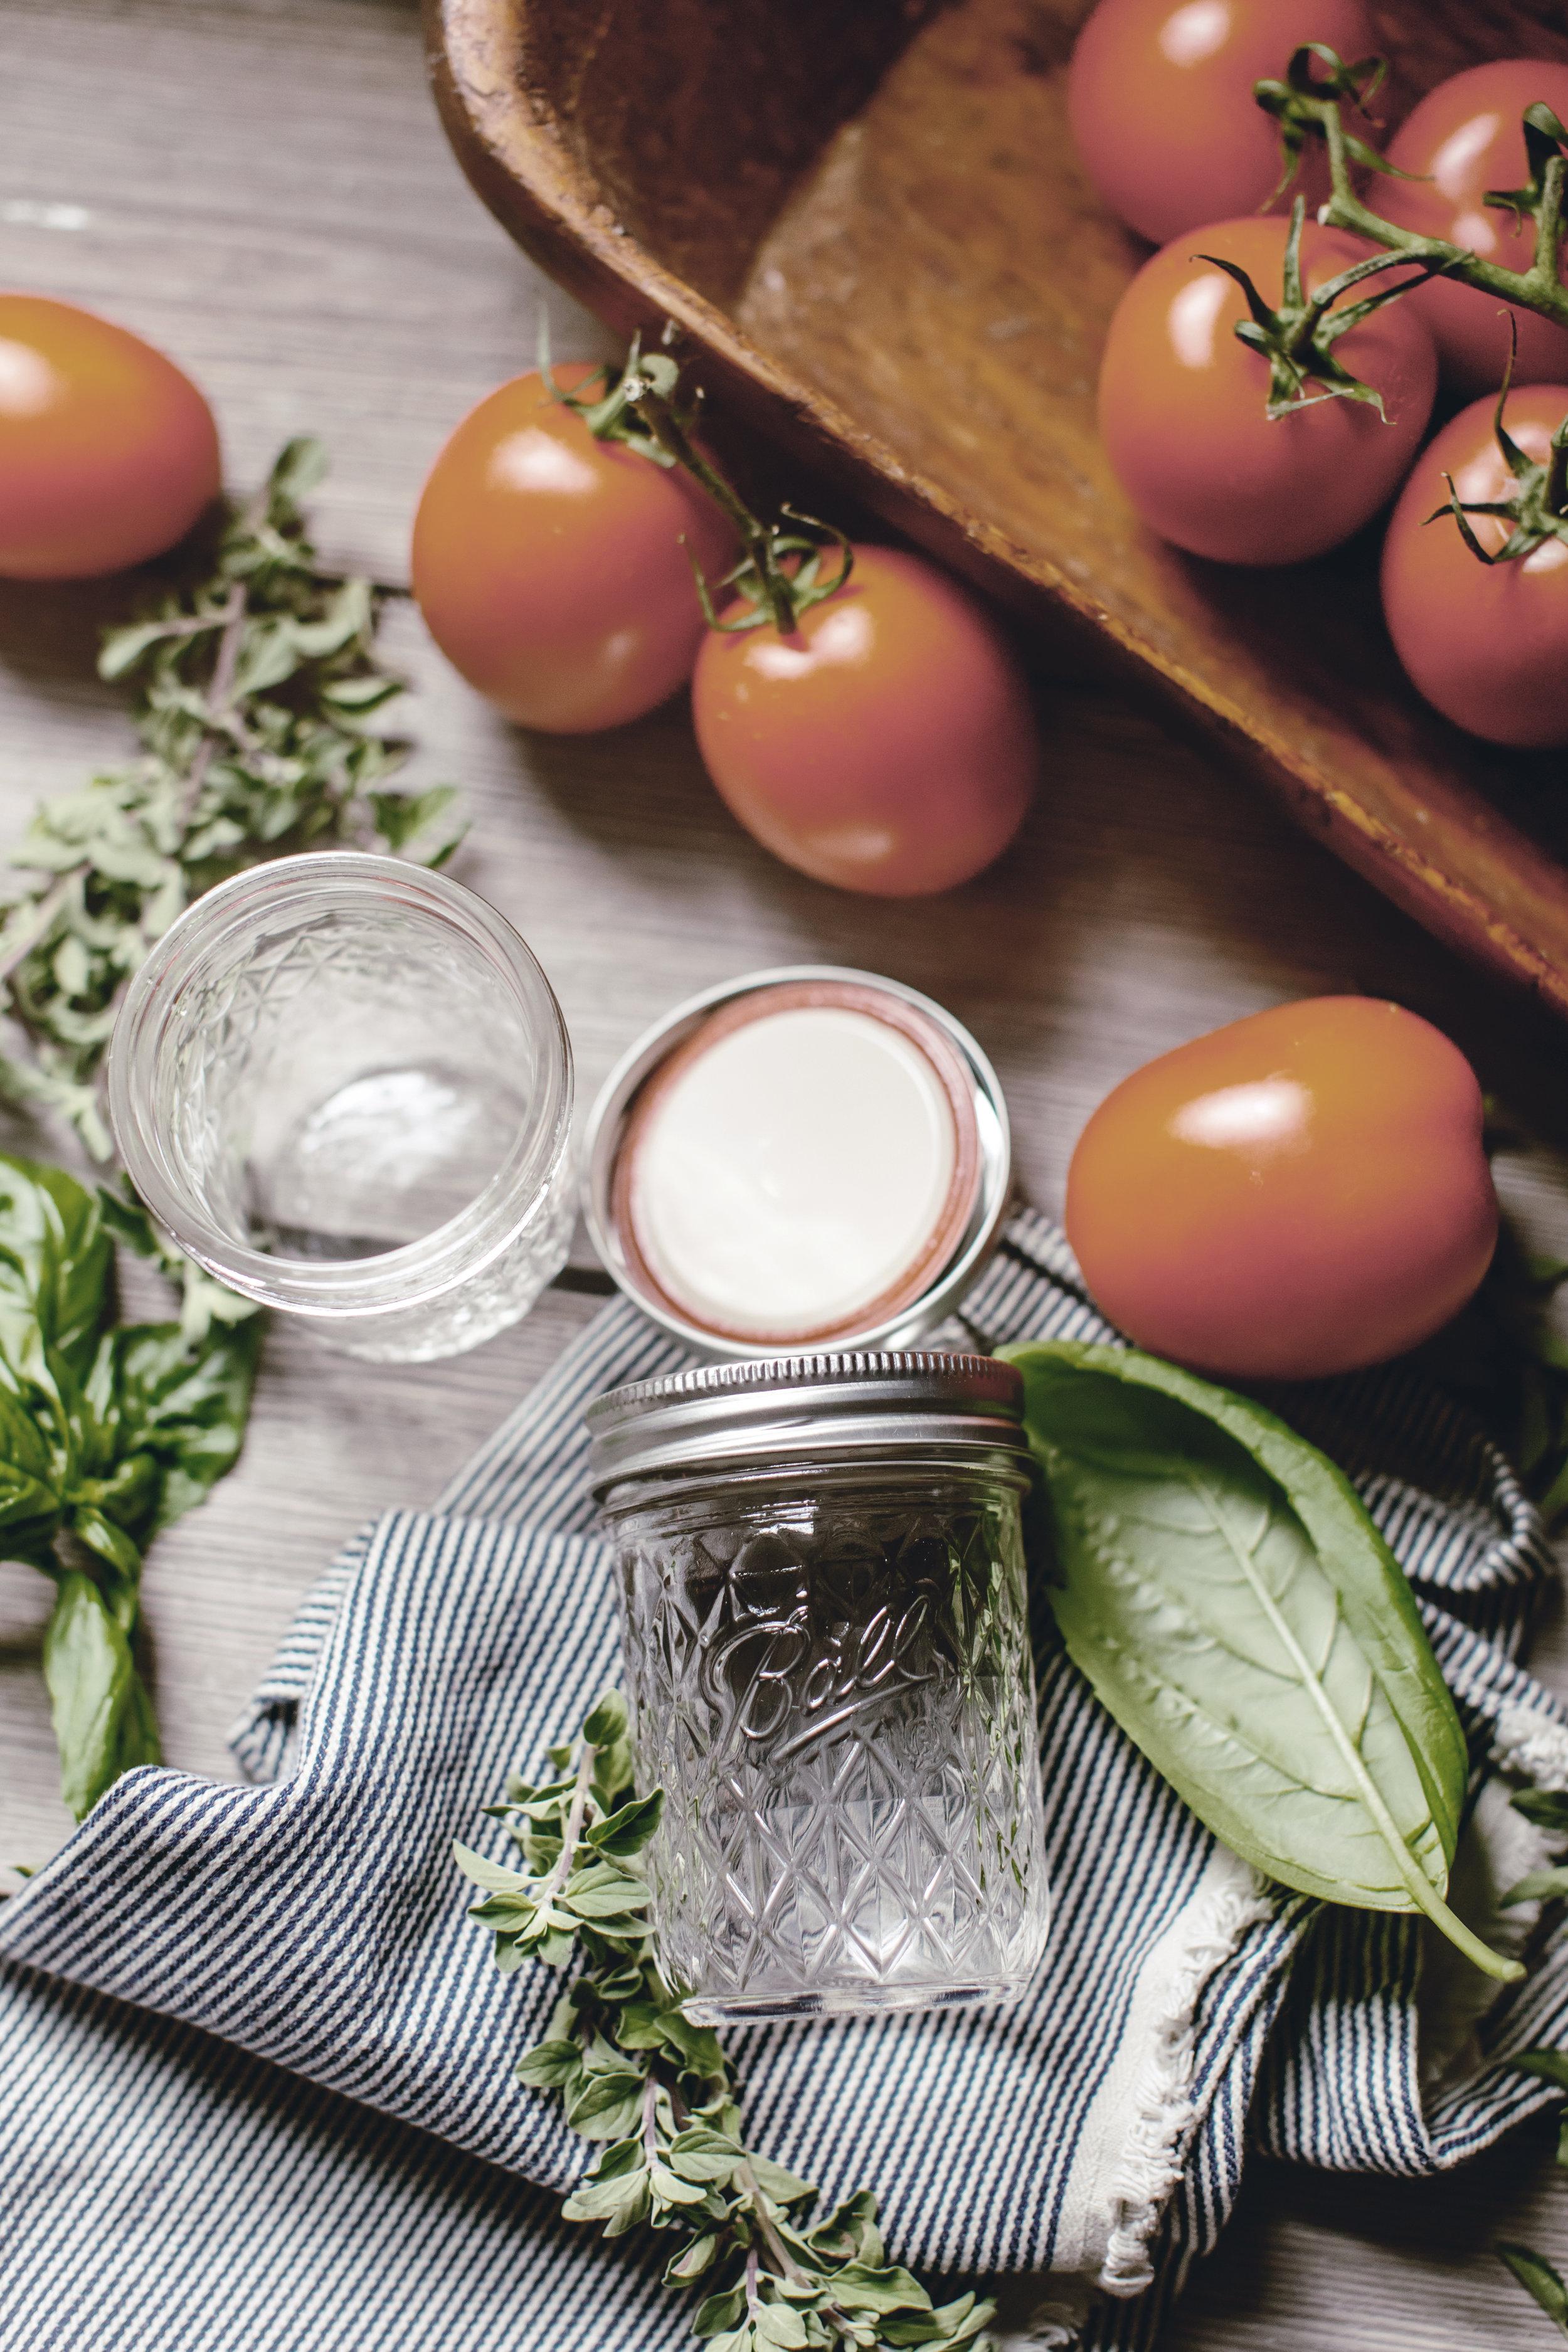 Roasted tomato sauce / heirloomed